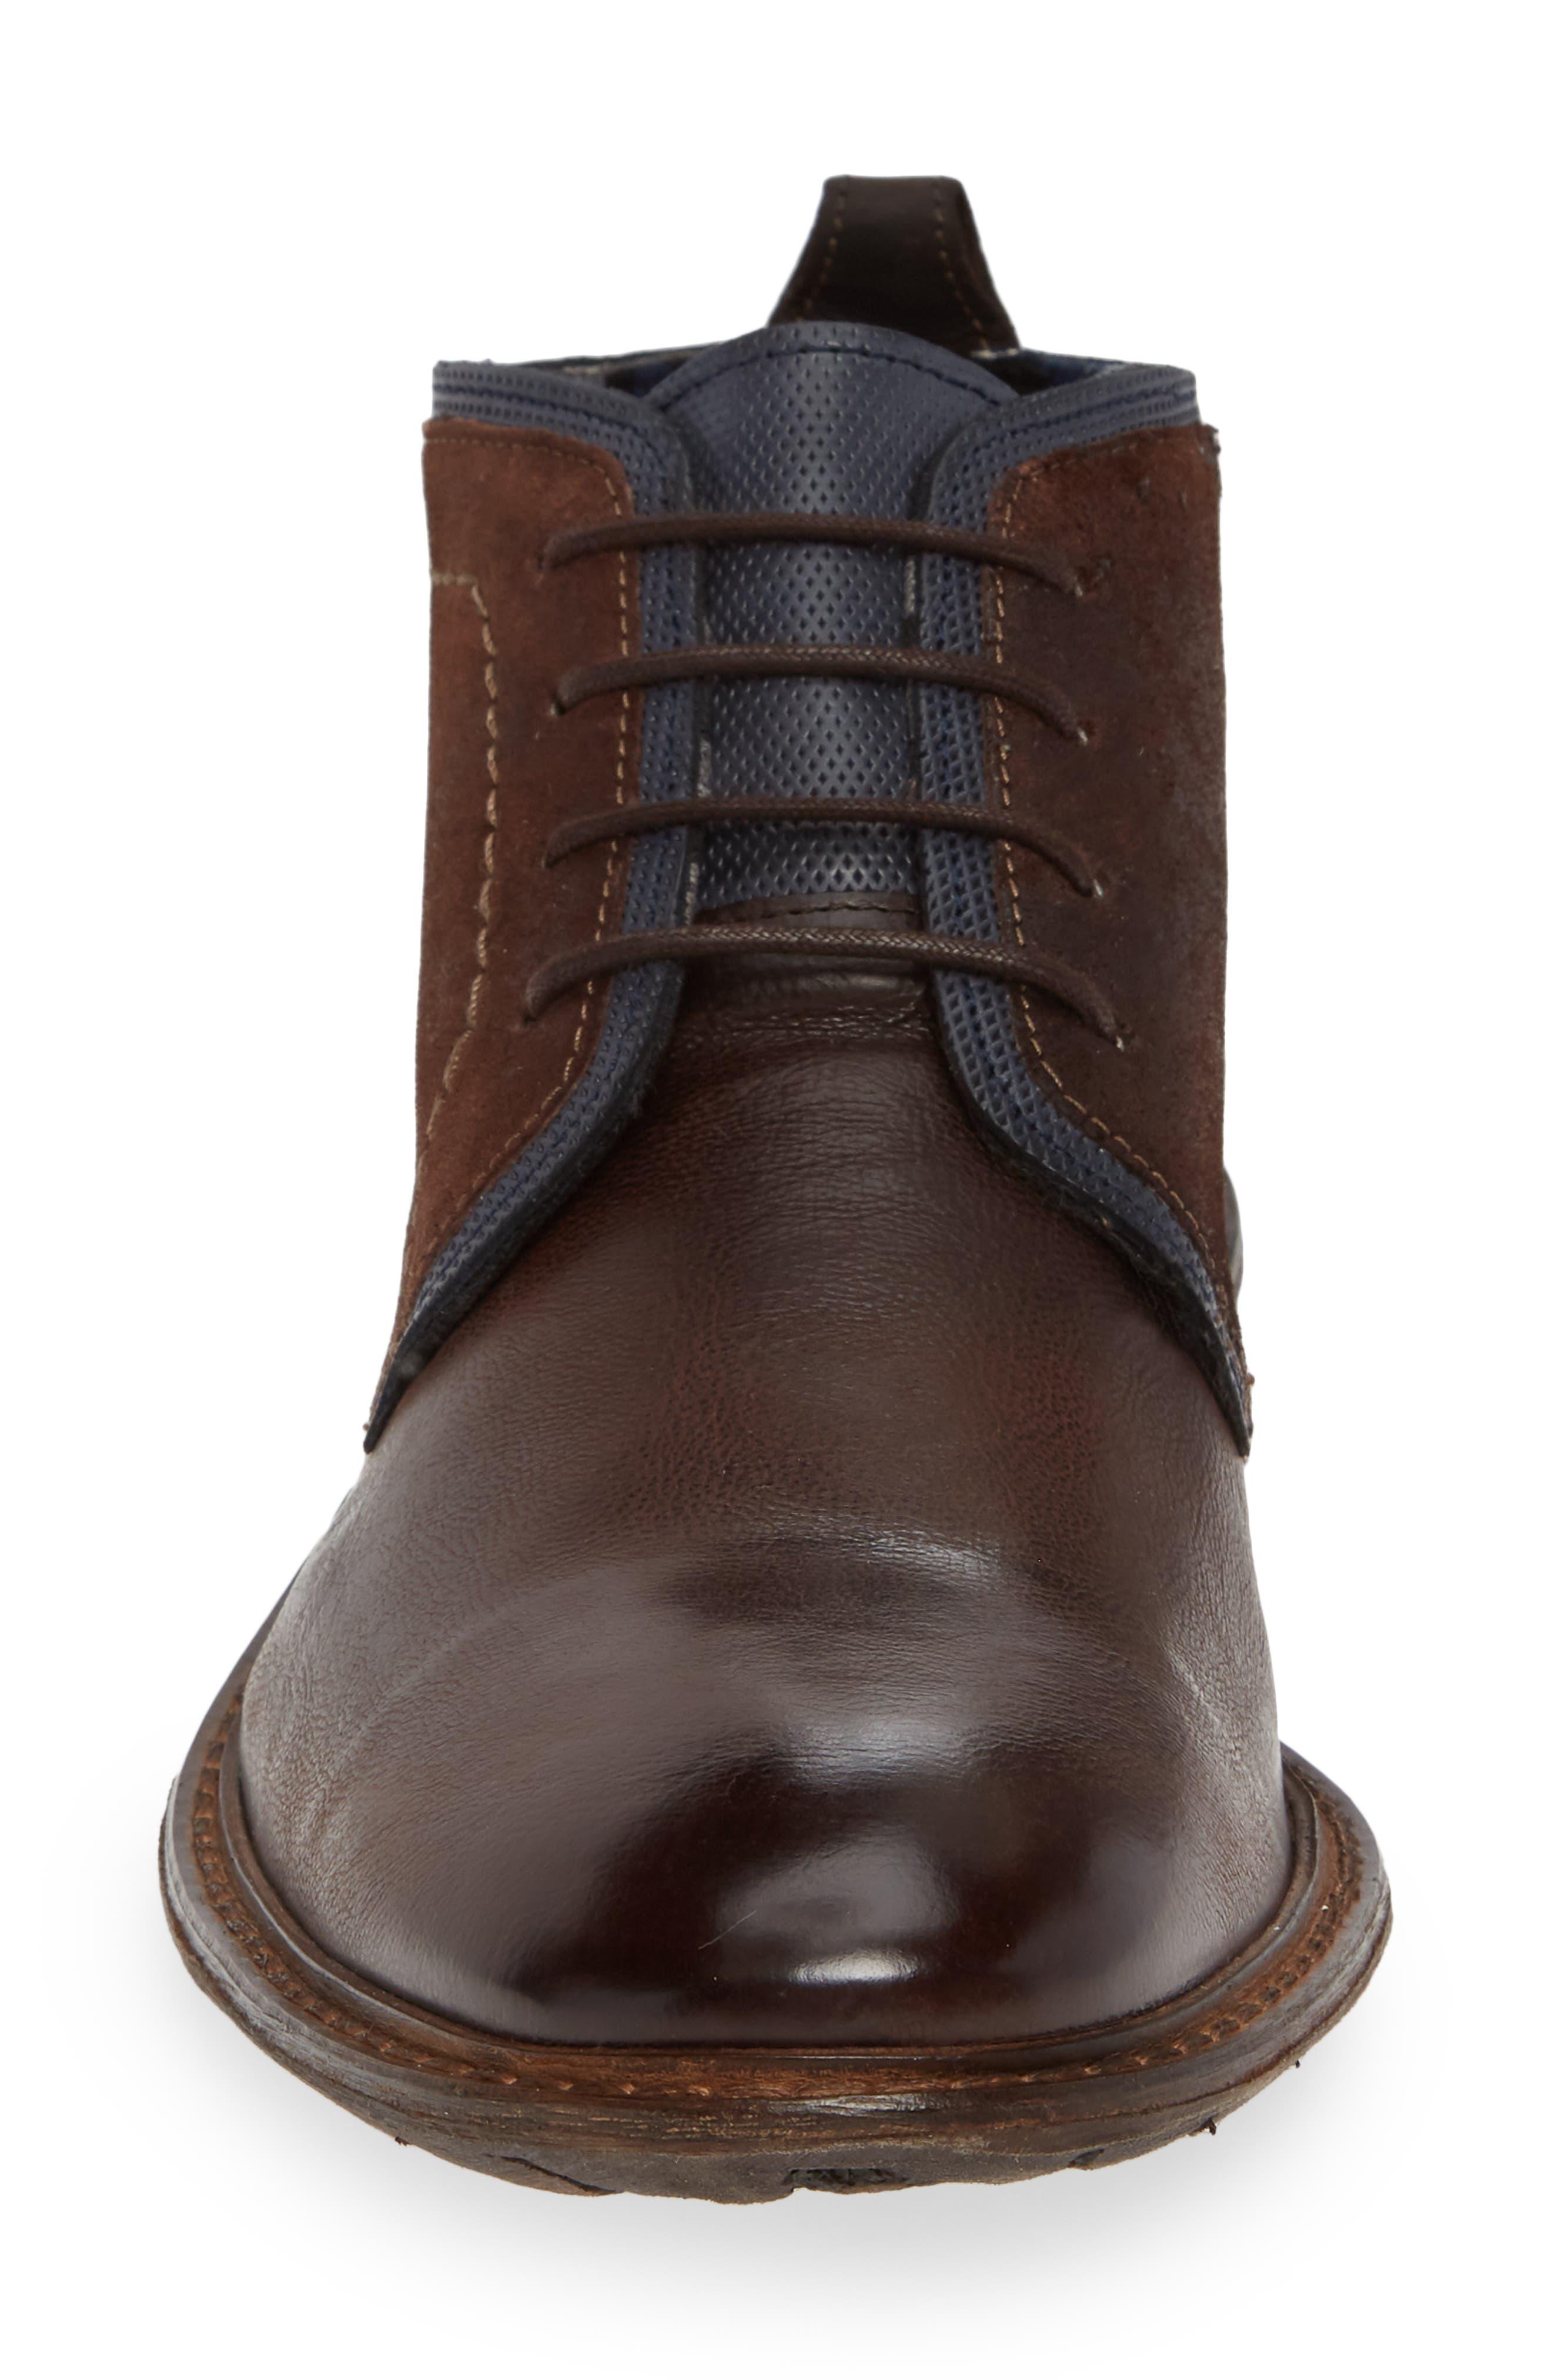 Dingo Plain Toe Boot,                             Alternate thumbnail 4, color,                             TOBACCO LEATHER